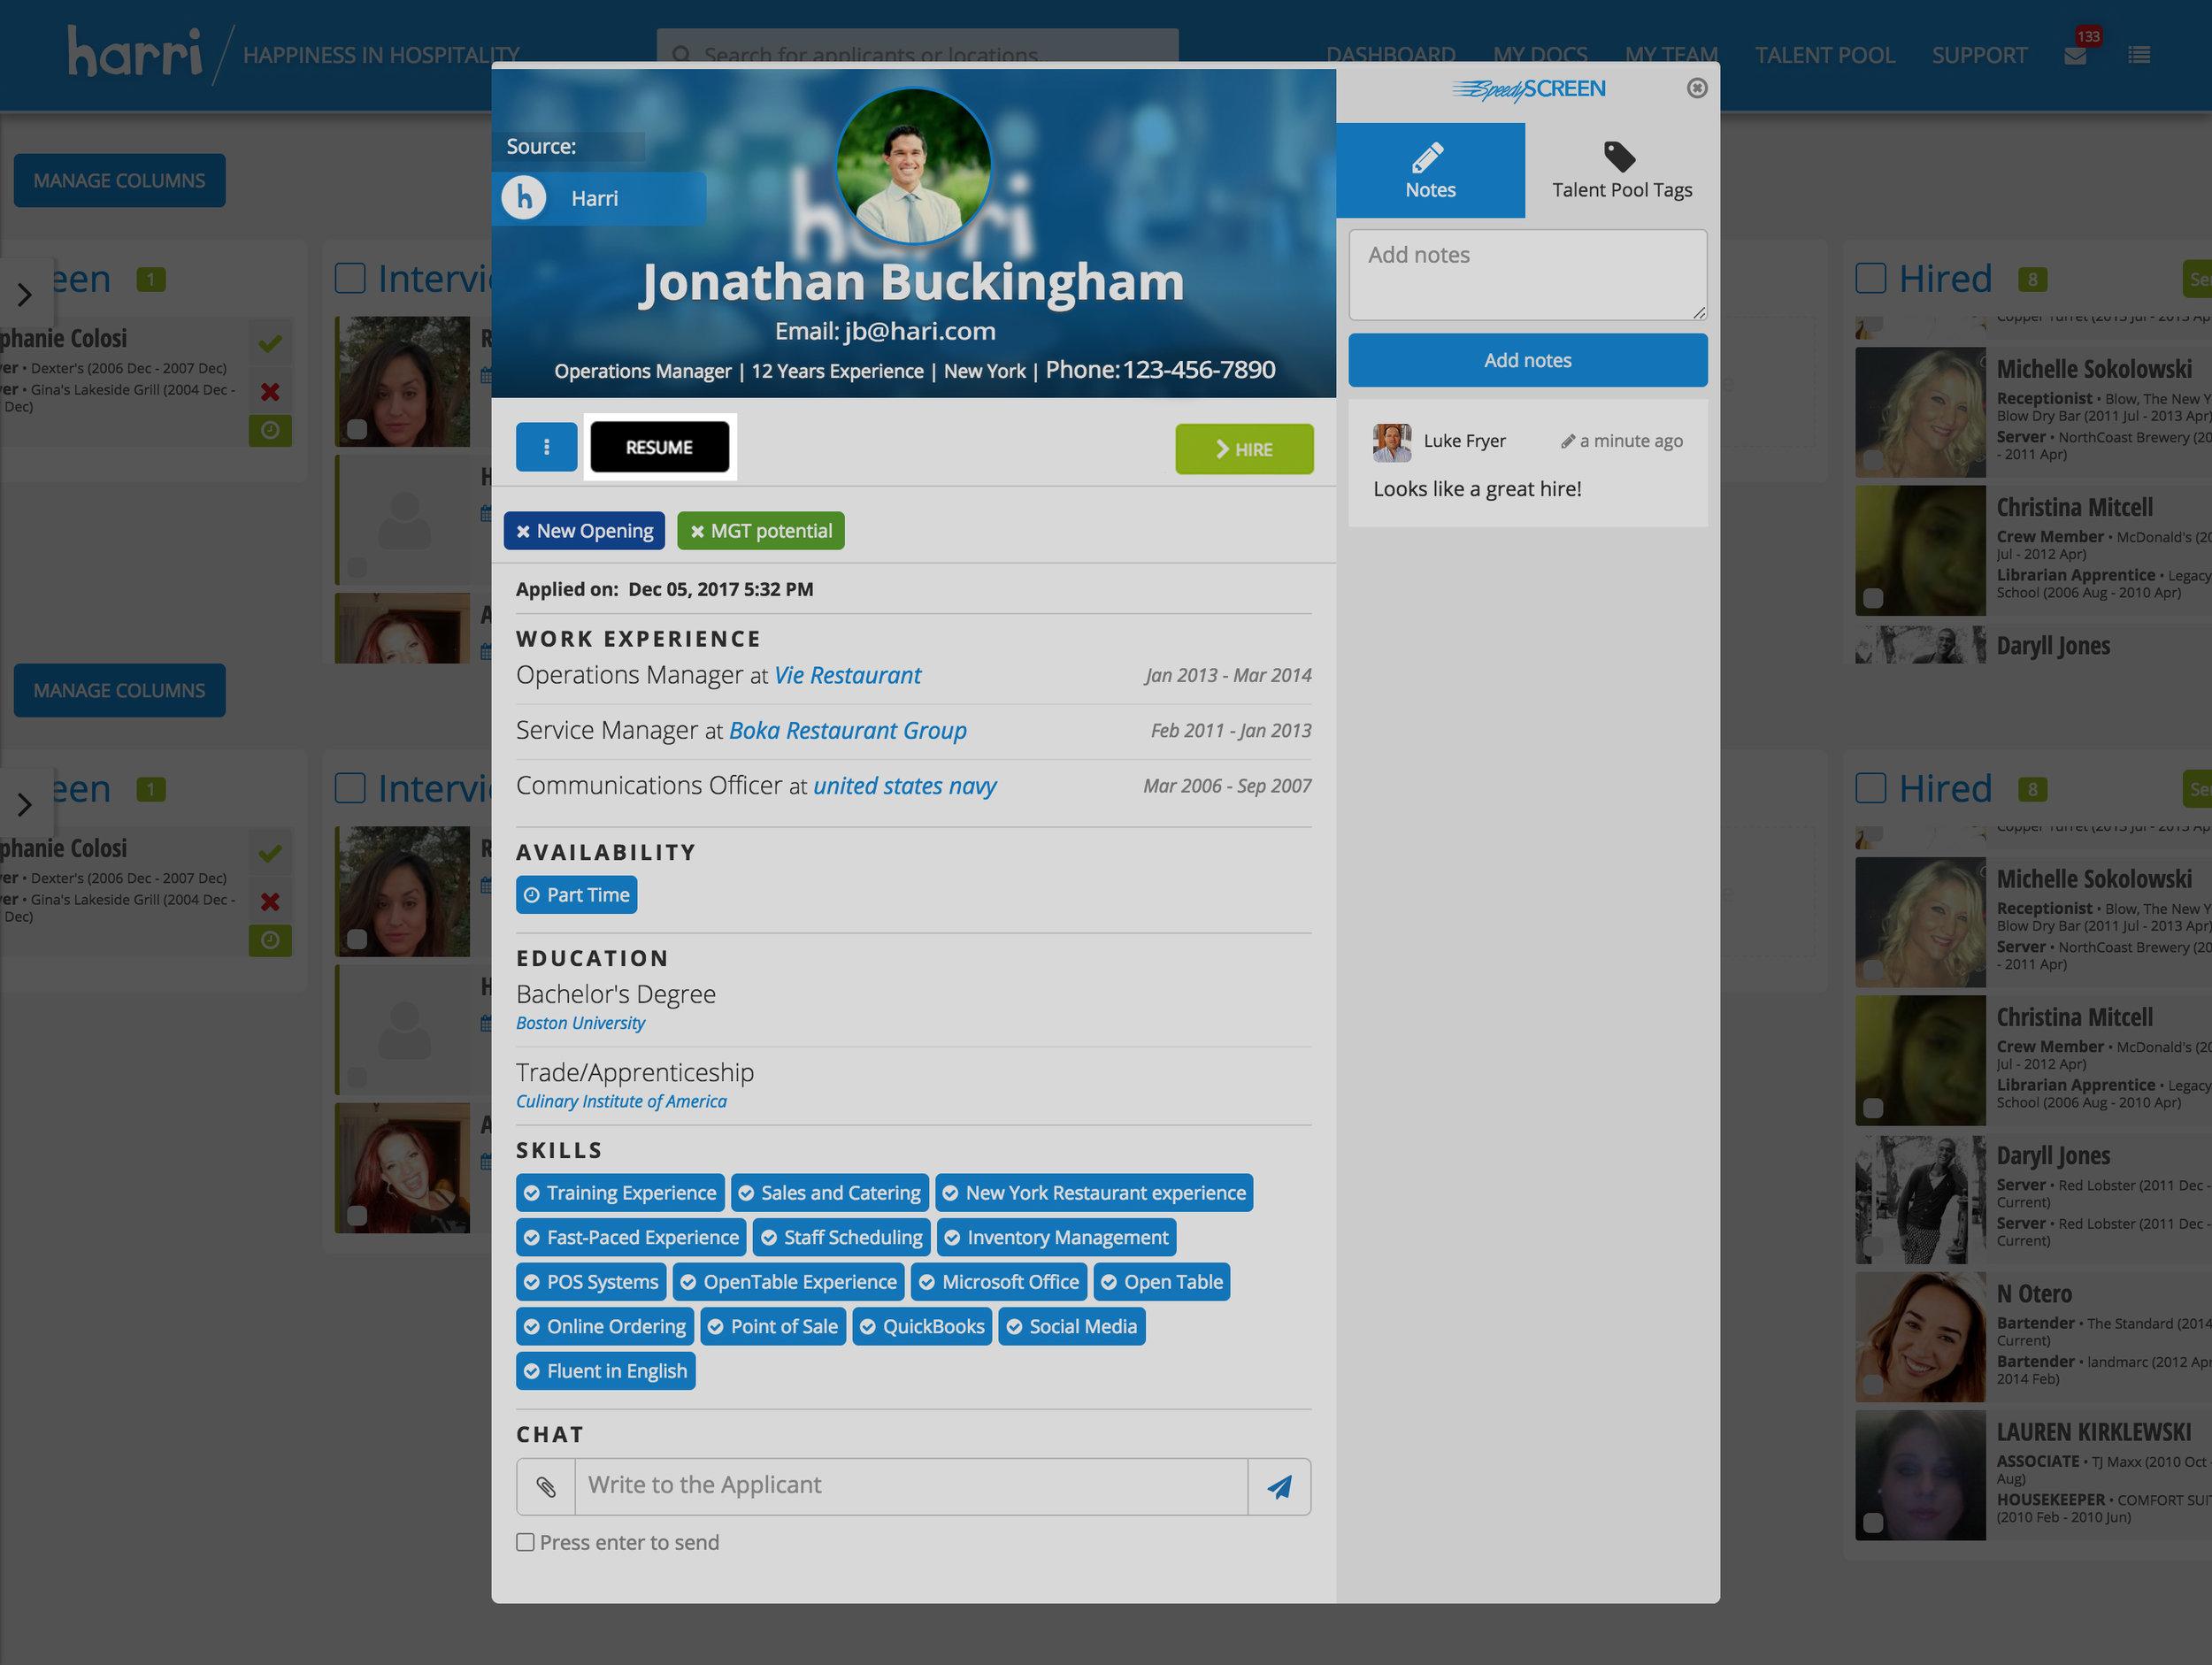 Enhanced Resume/CV Visibility -